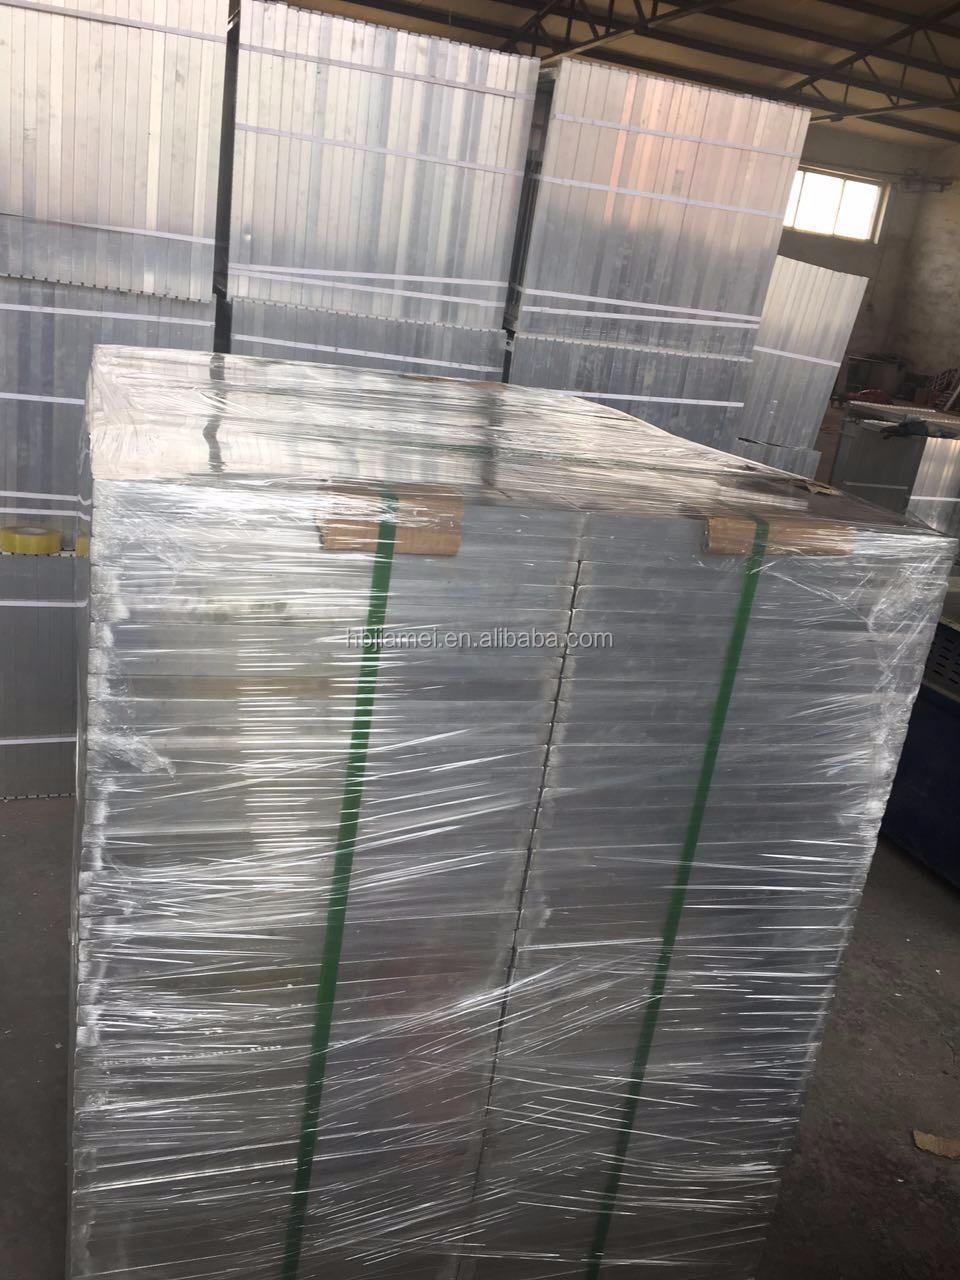 Siebdruck Rahmen/siebdruck Material/siebdruck Liefert - Buy Product ...